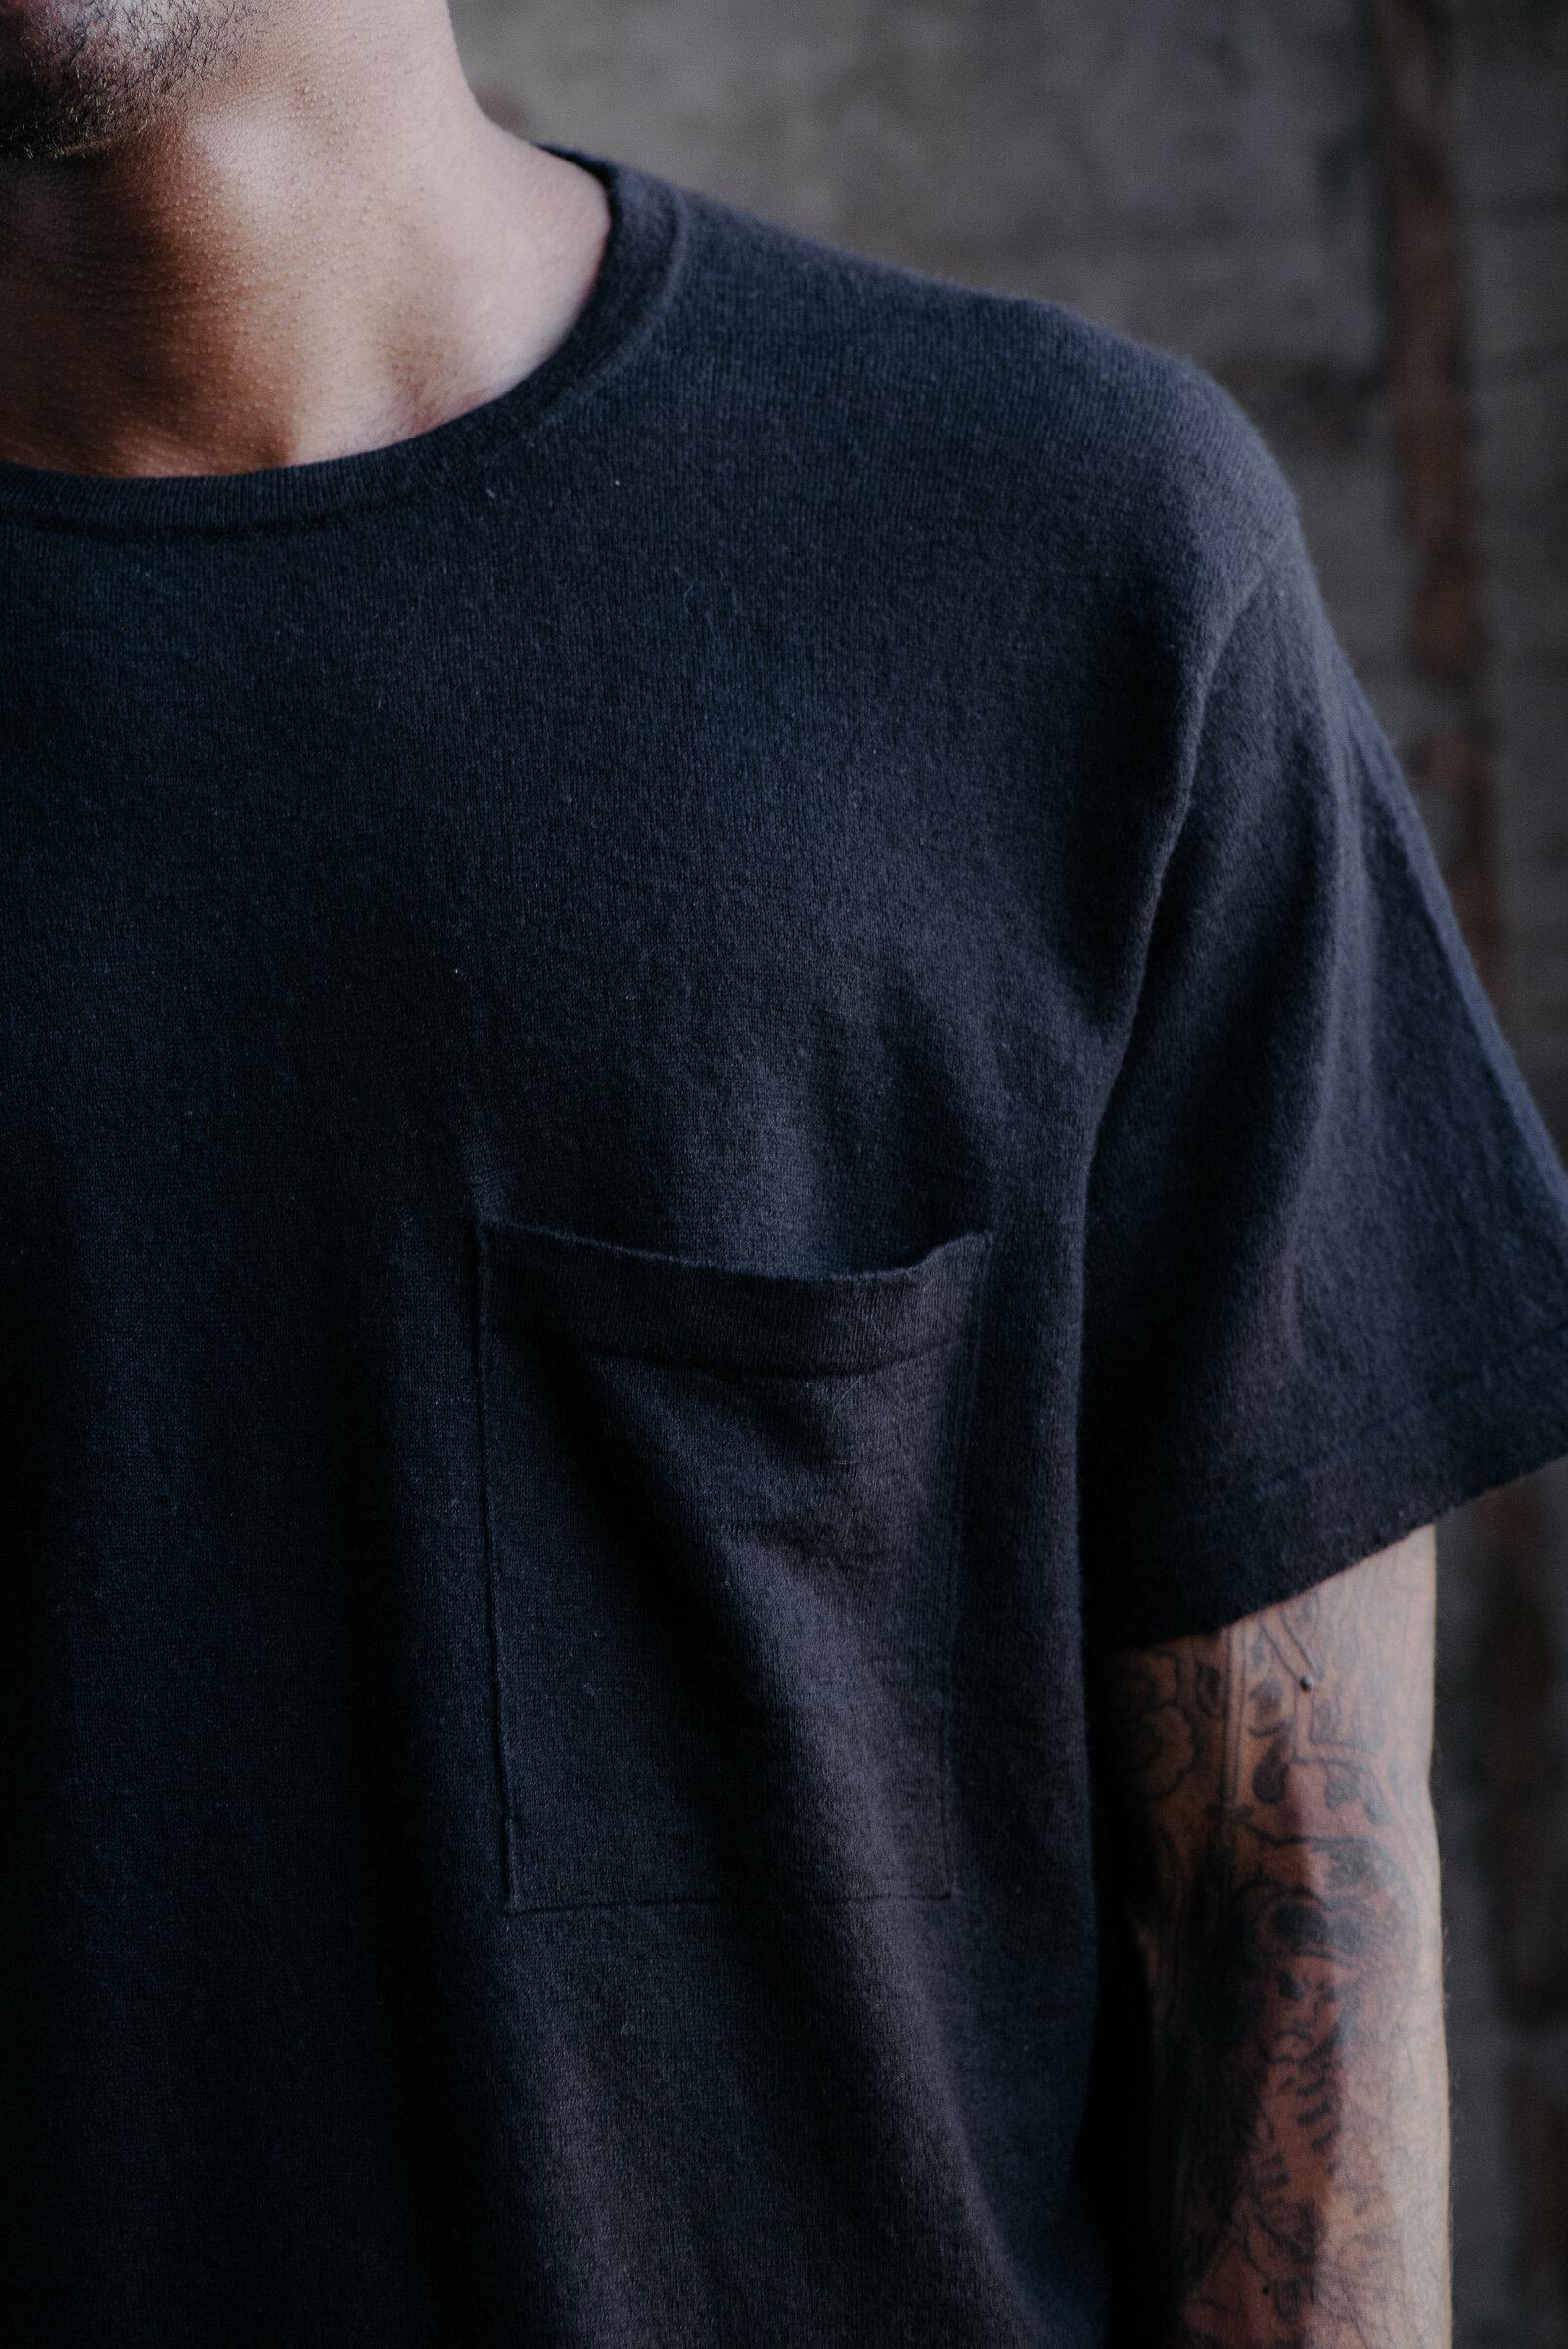 evan-kinori-pocket-tee-sweater-cashmere-linen-silk-made-in-italy-4